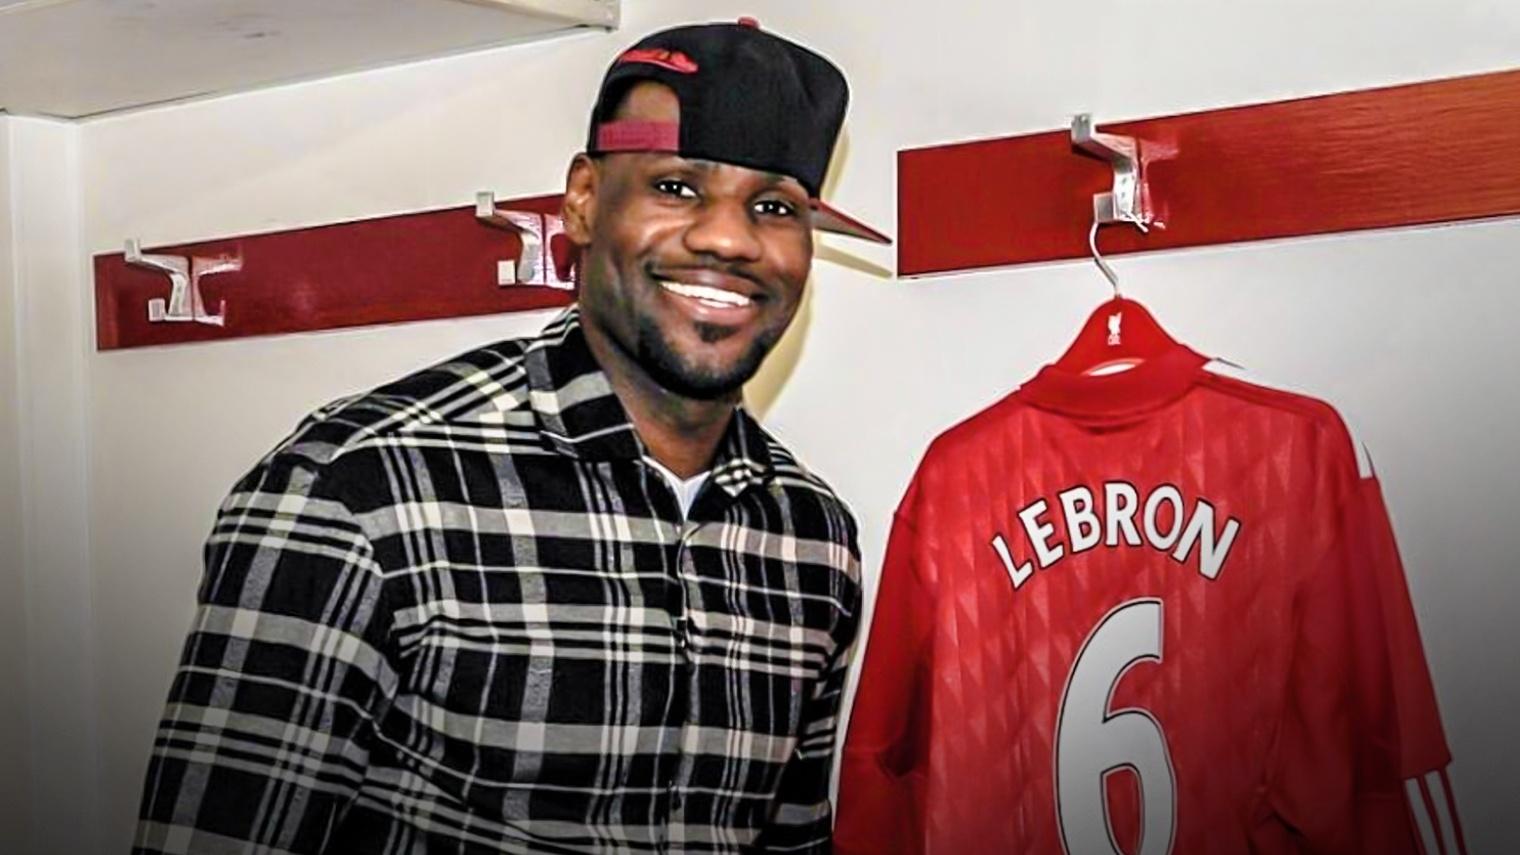 Lebron Liverpool